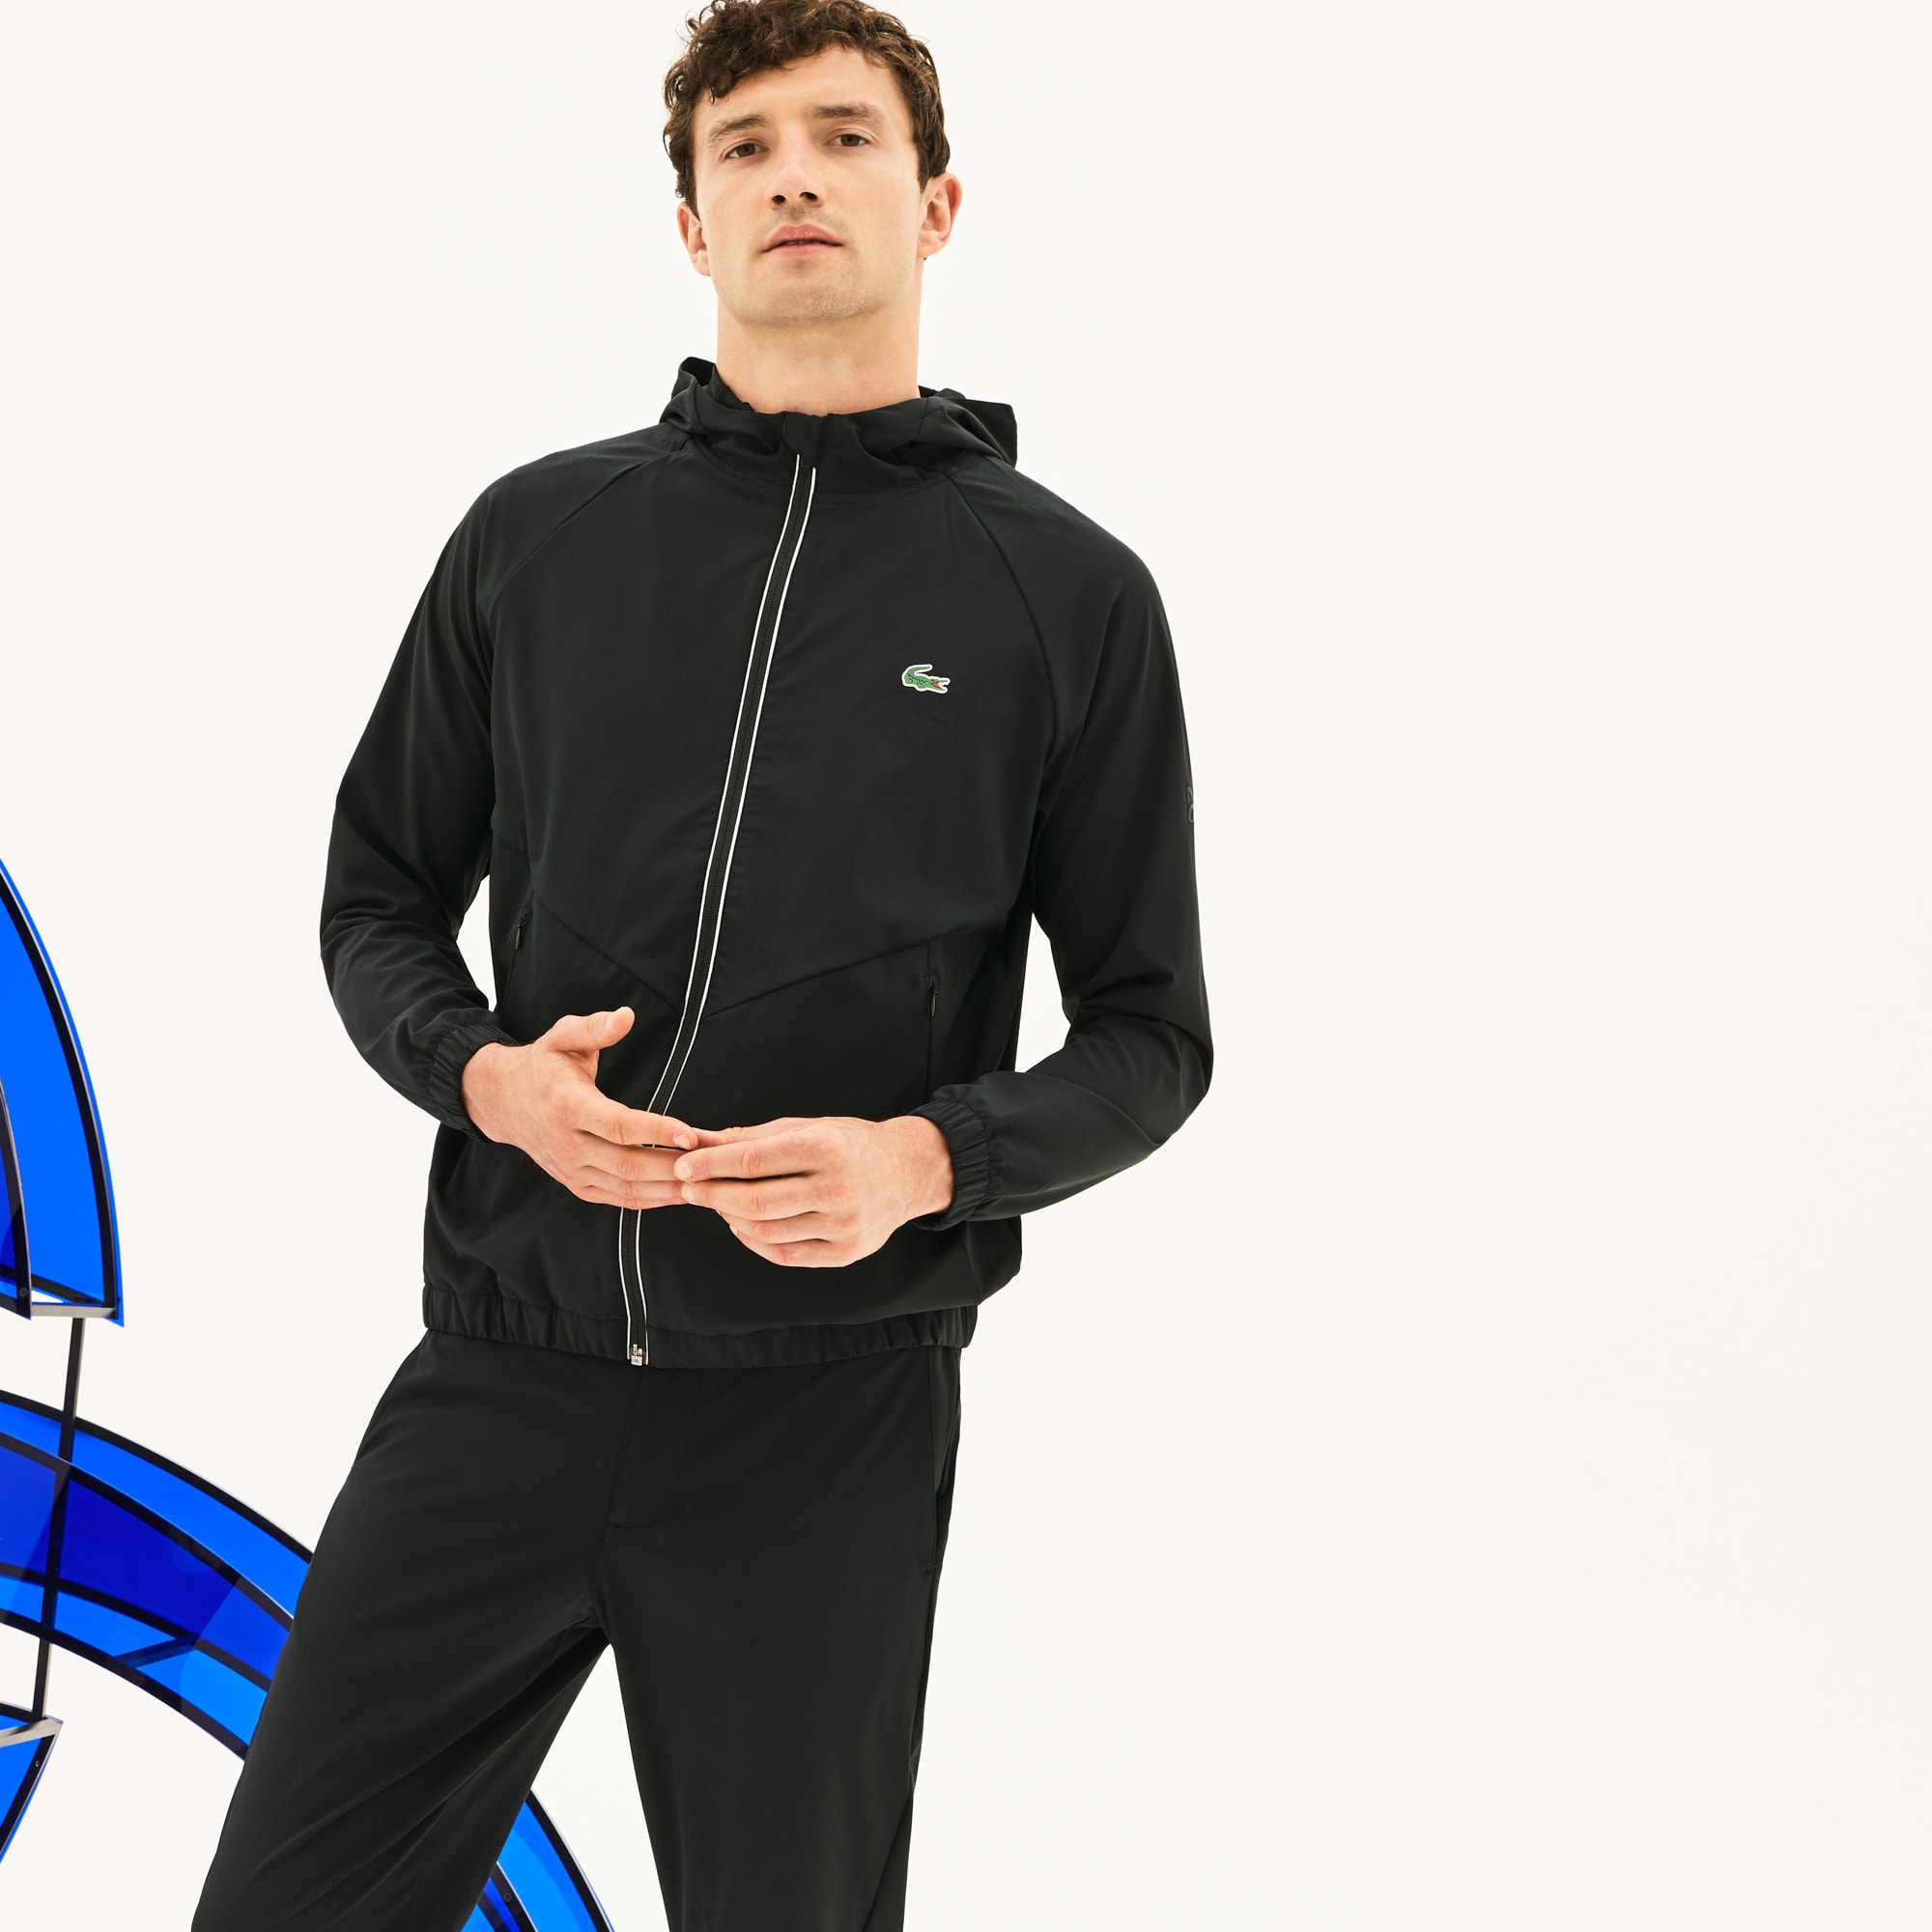 Clothing Clothing Clothing Men's Clothing Lacoste Men's Men's Lacoste Men's Lacoste Clothing Lacoste Men's qPwnSftq